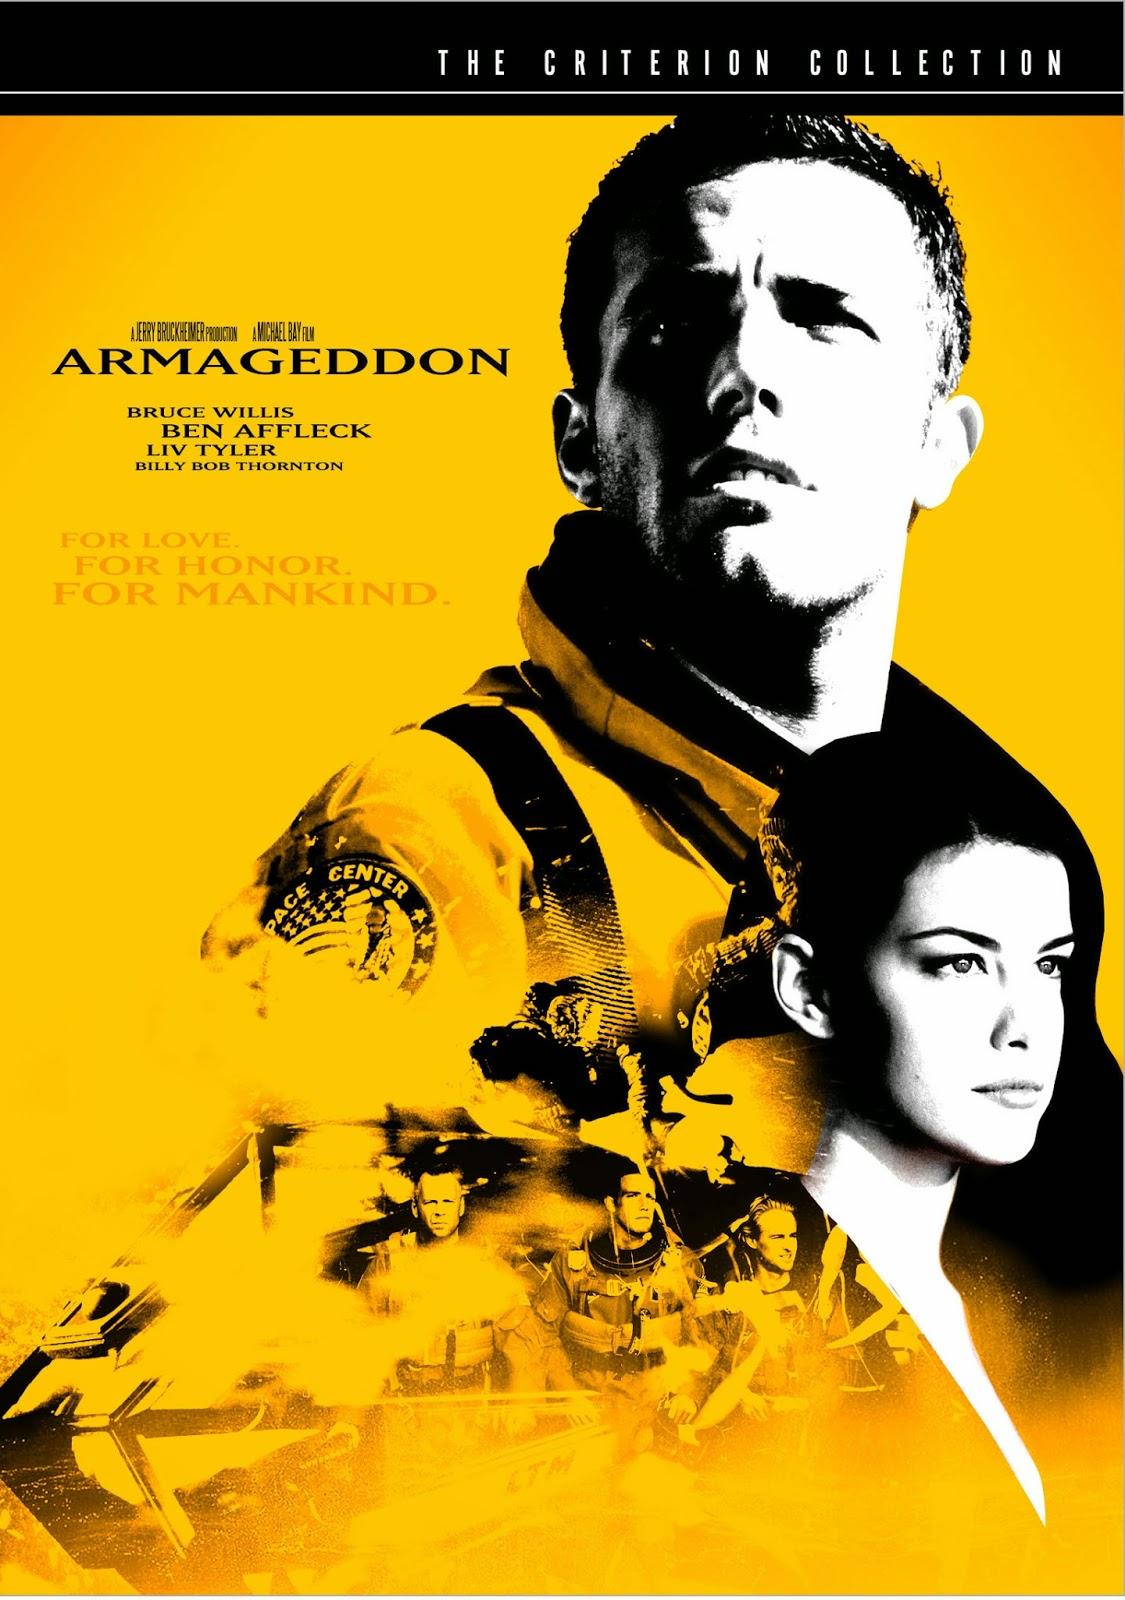 Armageddon อามาเกดดอน วันโลกาวินาศ [HD][พากย์ไทย]